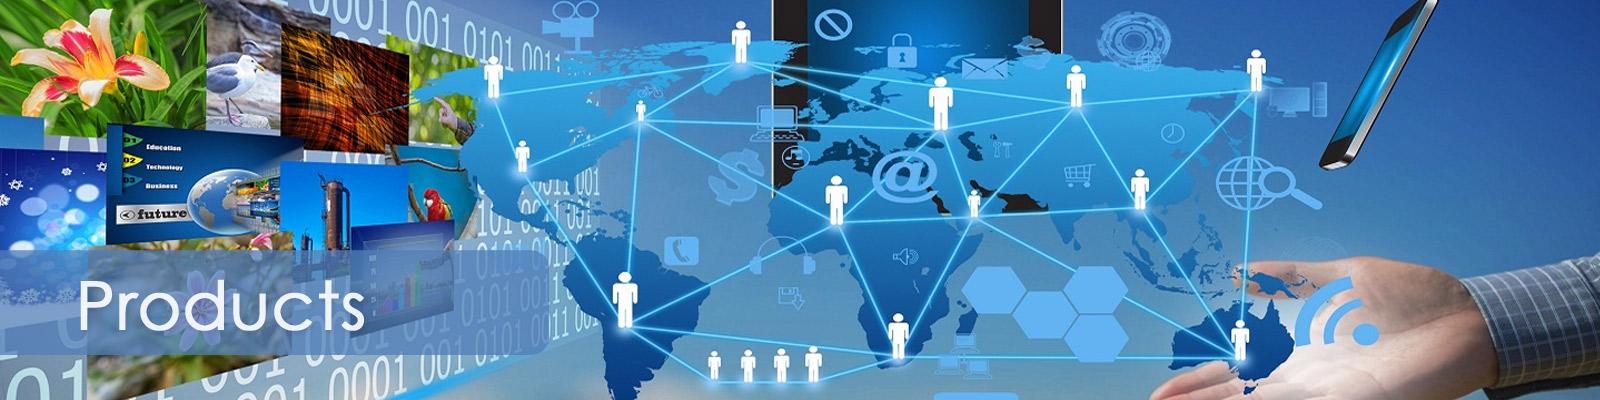 Pakistan Email Marketing Data, Bulk Email Marketing Software, Email